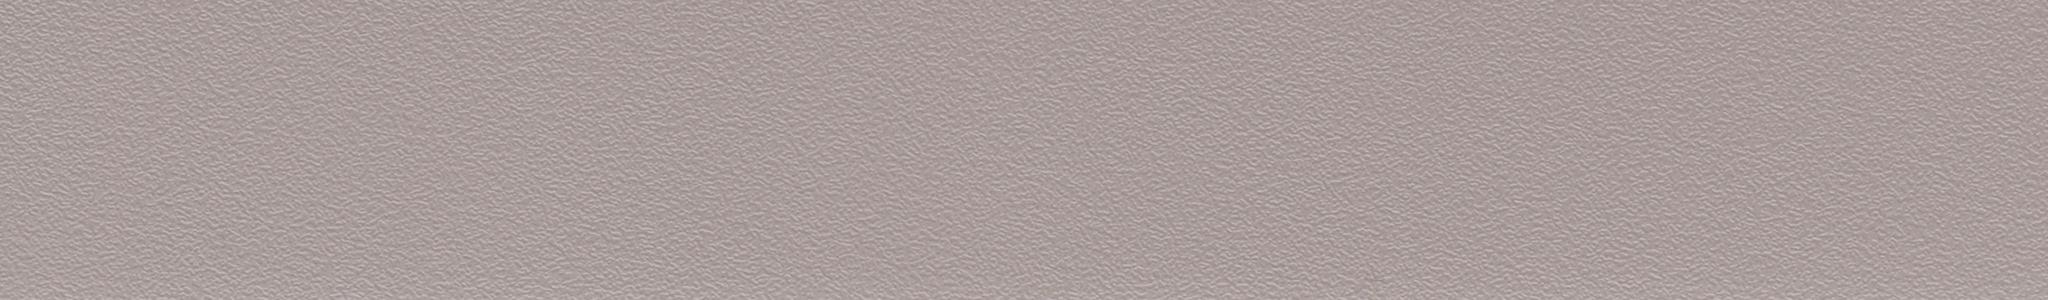 HU 181600 Кромка ABS Коричневый Трюфель - Шагрень XG